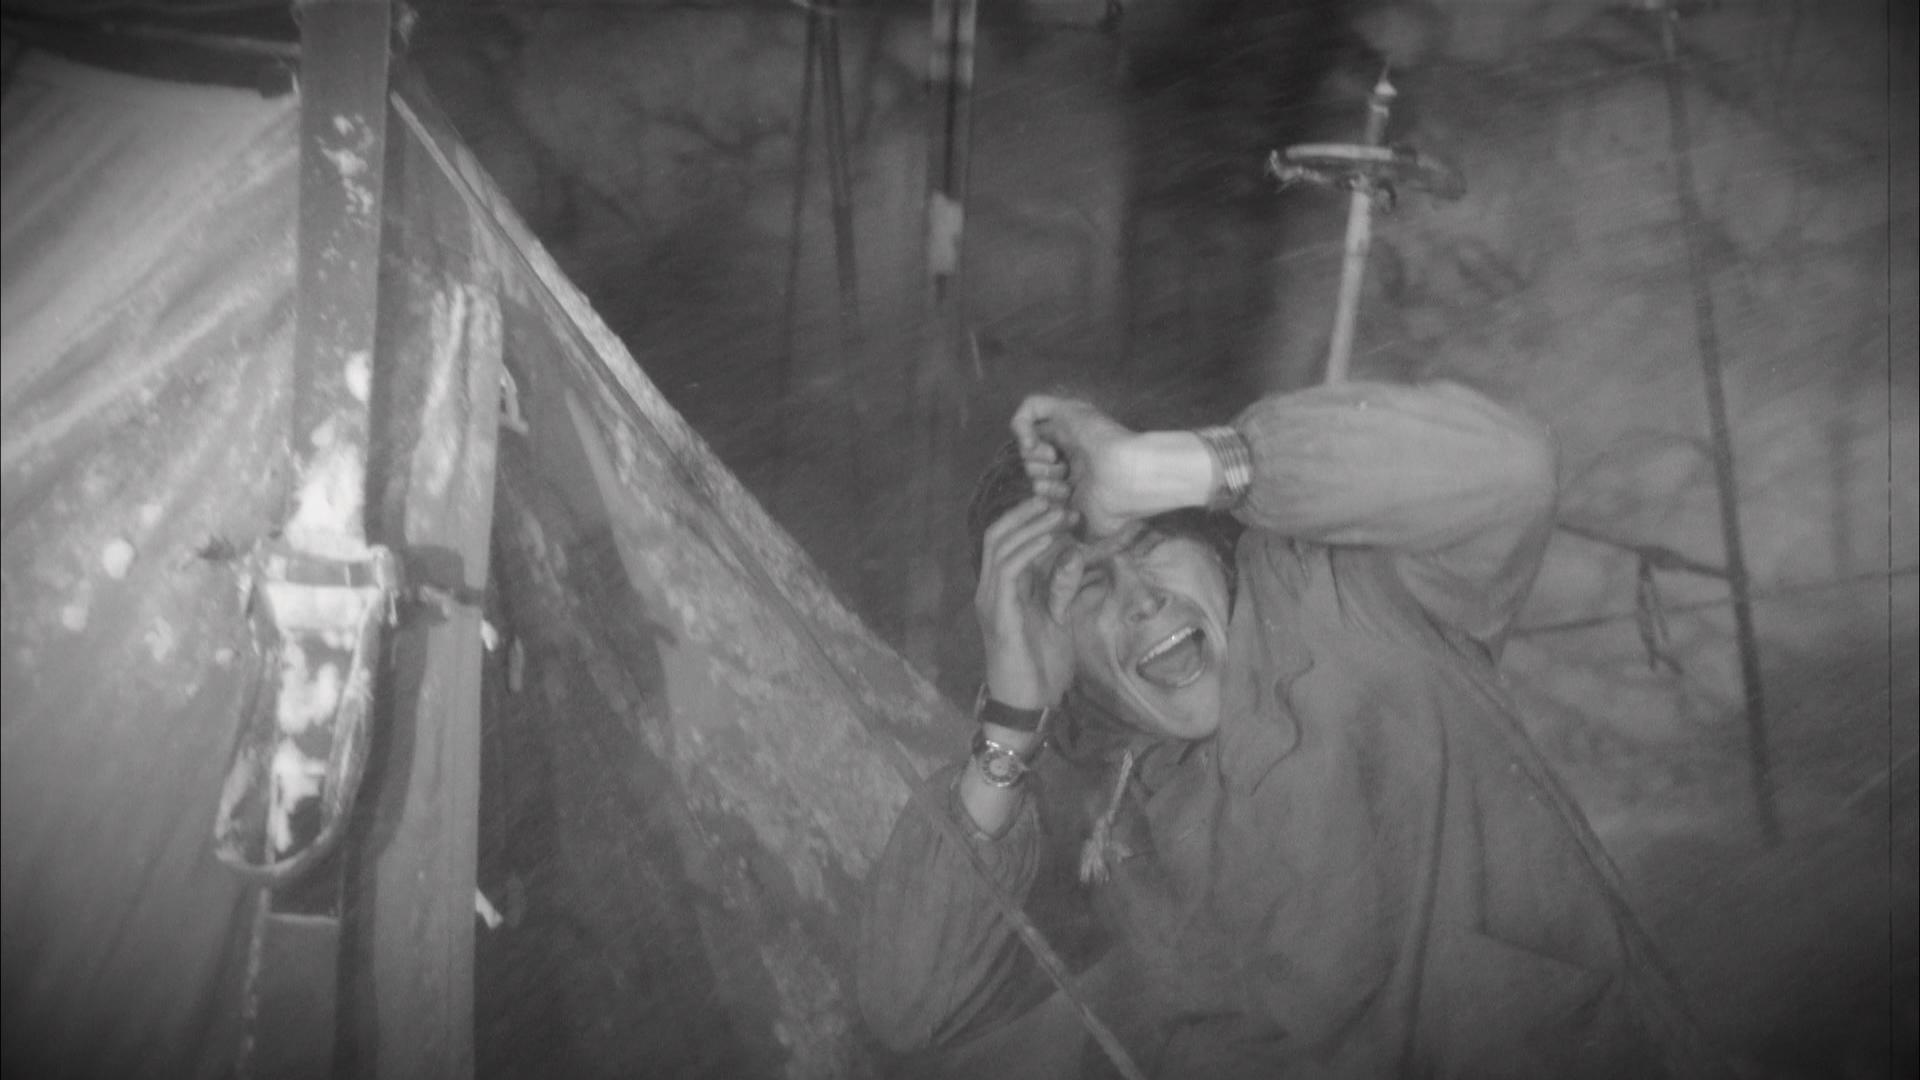 Перевал Дятлова. Конец истории